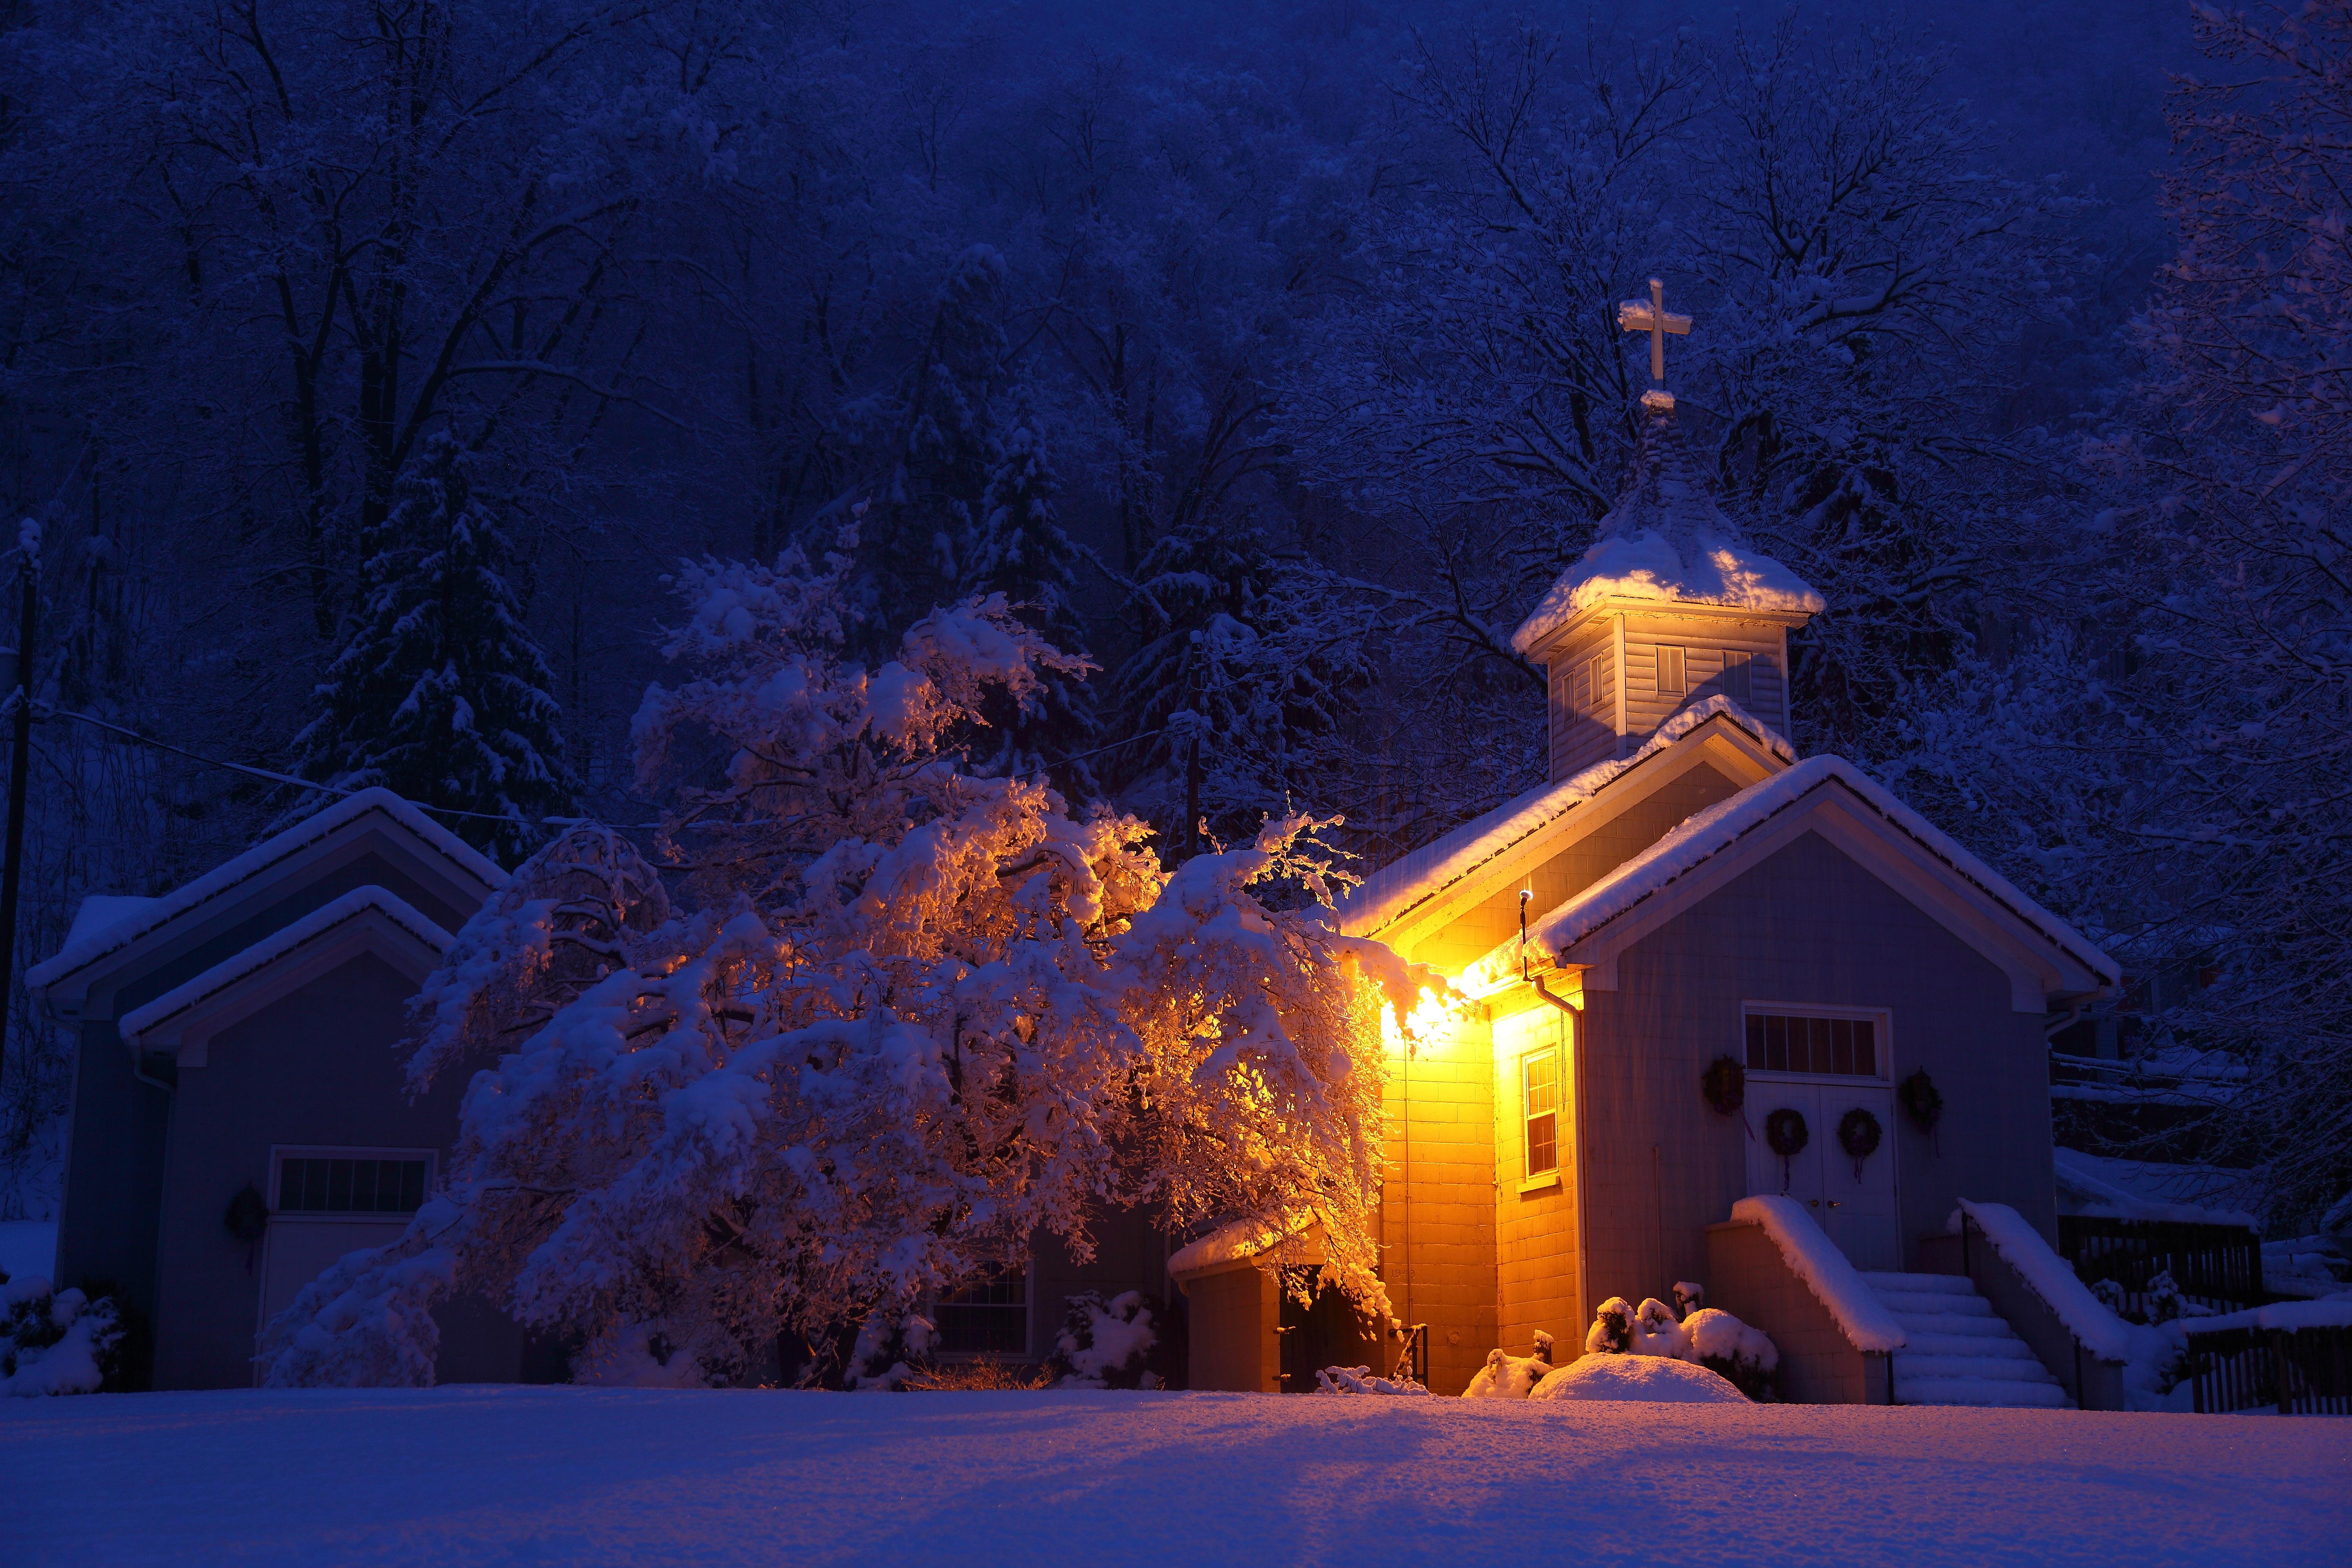 Christmas Snow Scene Decorations